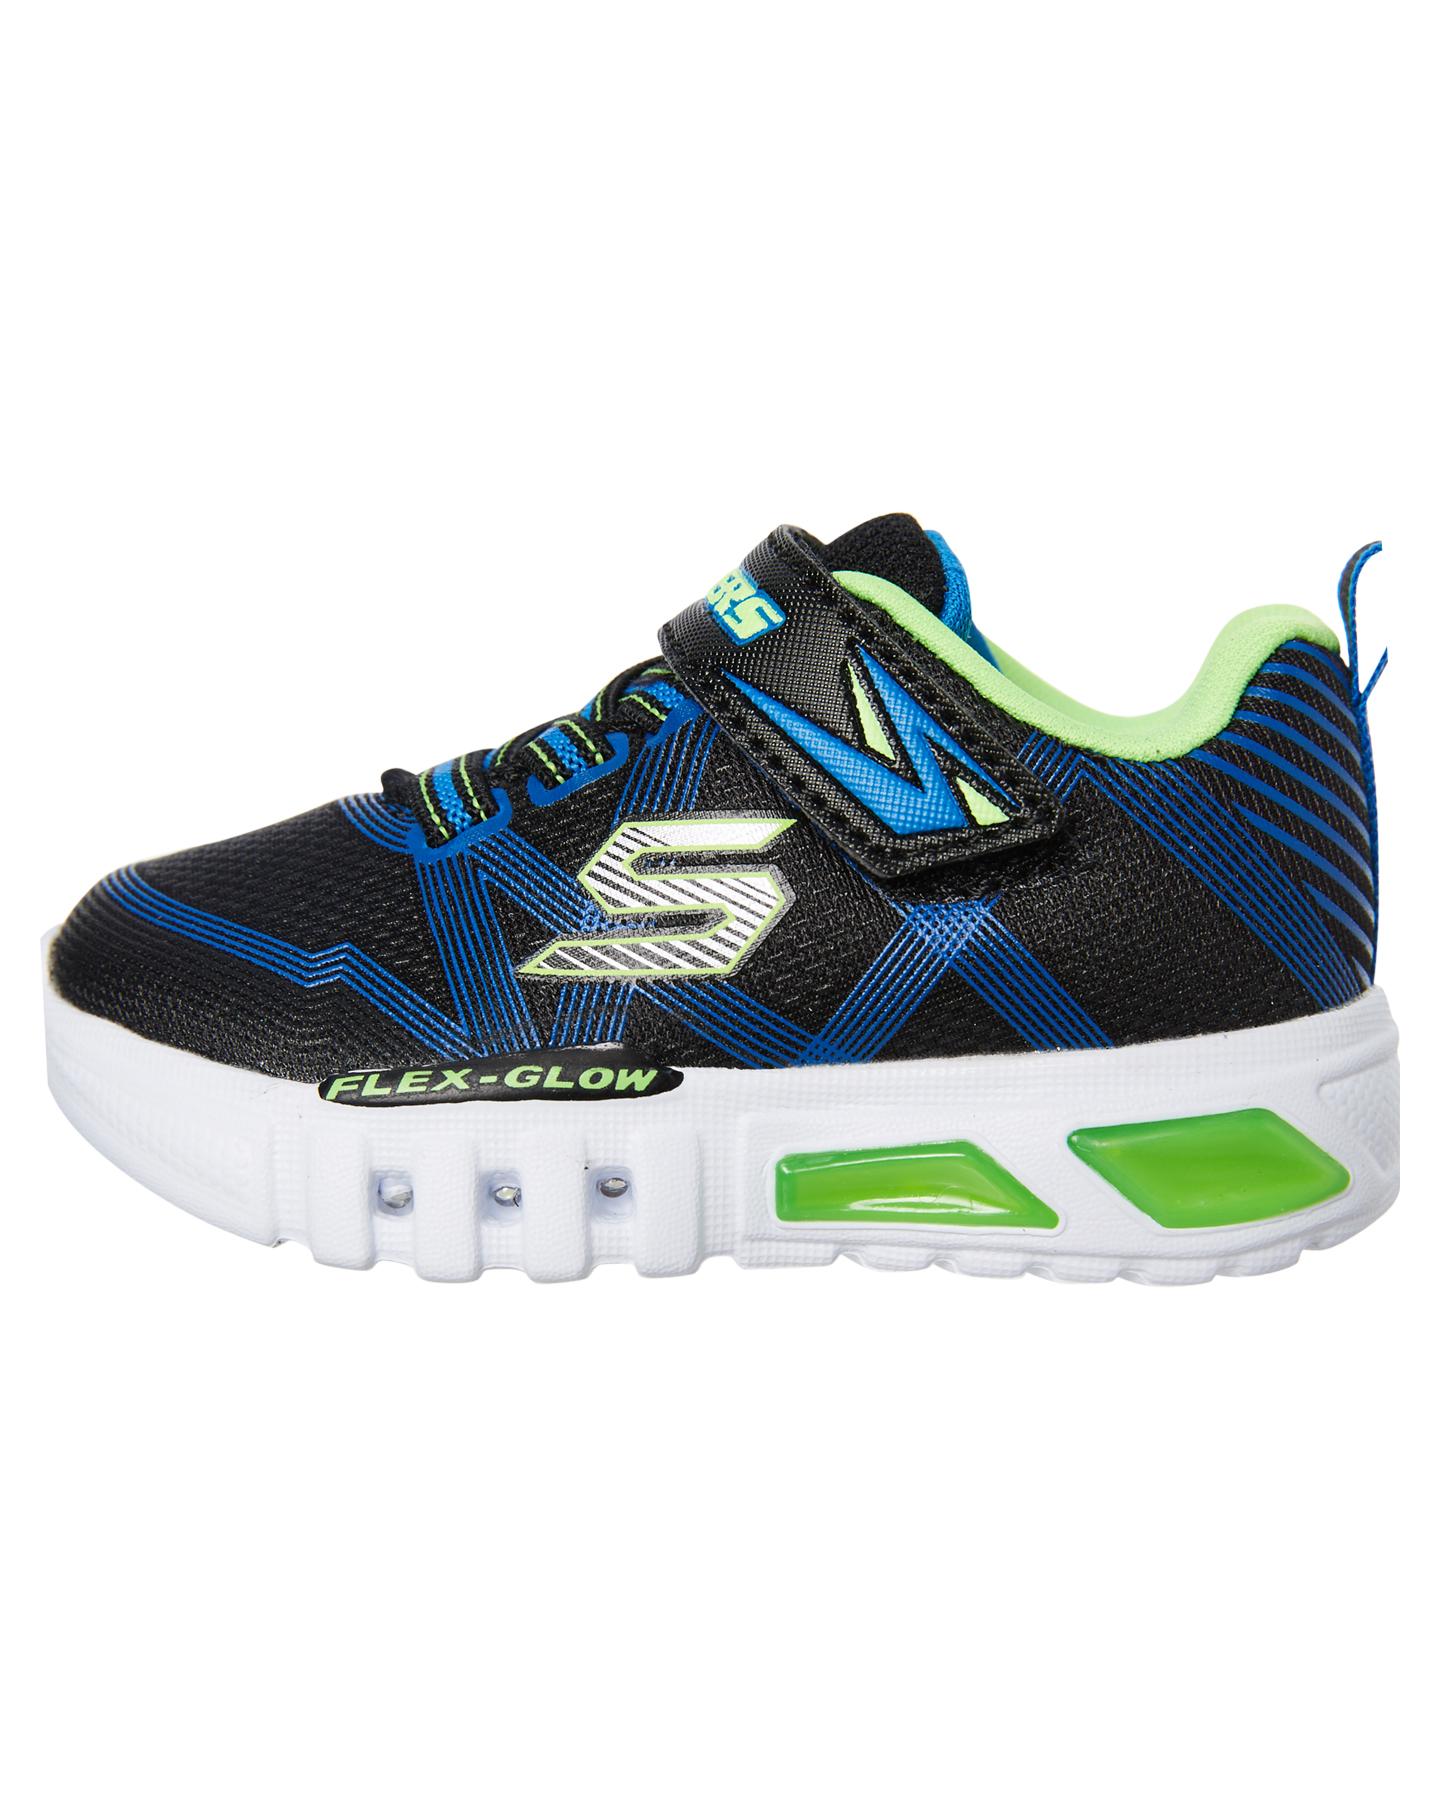 Skechers-Boys-Tots-Boys-Flex-Glow-Shoe-Lace-Mesh-Blue thumbnail 8